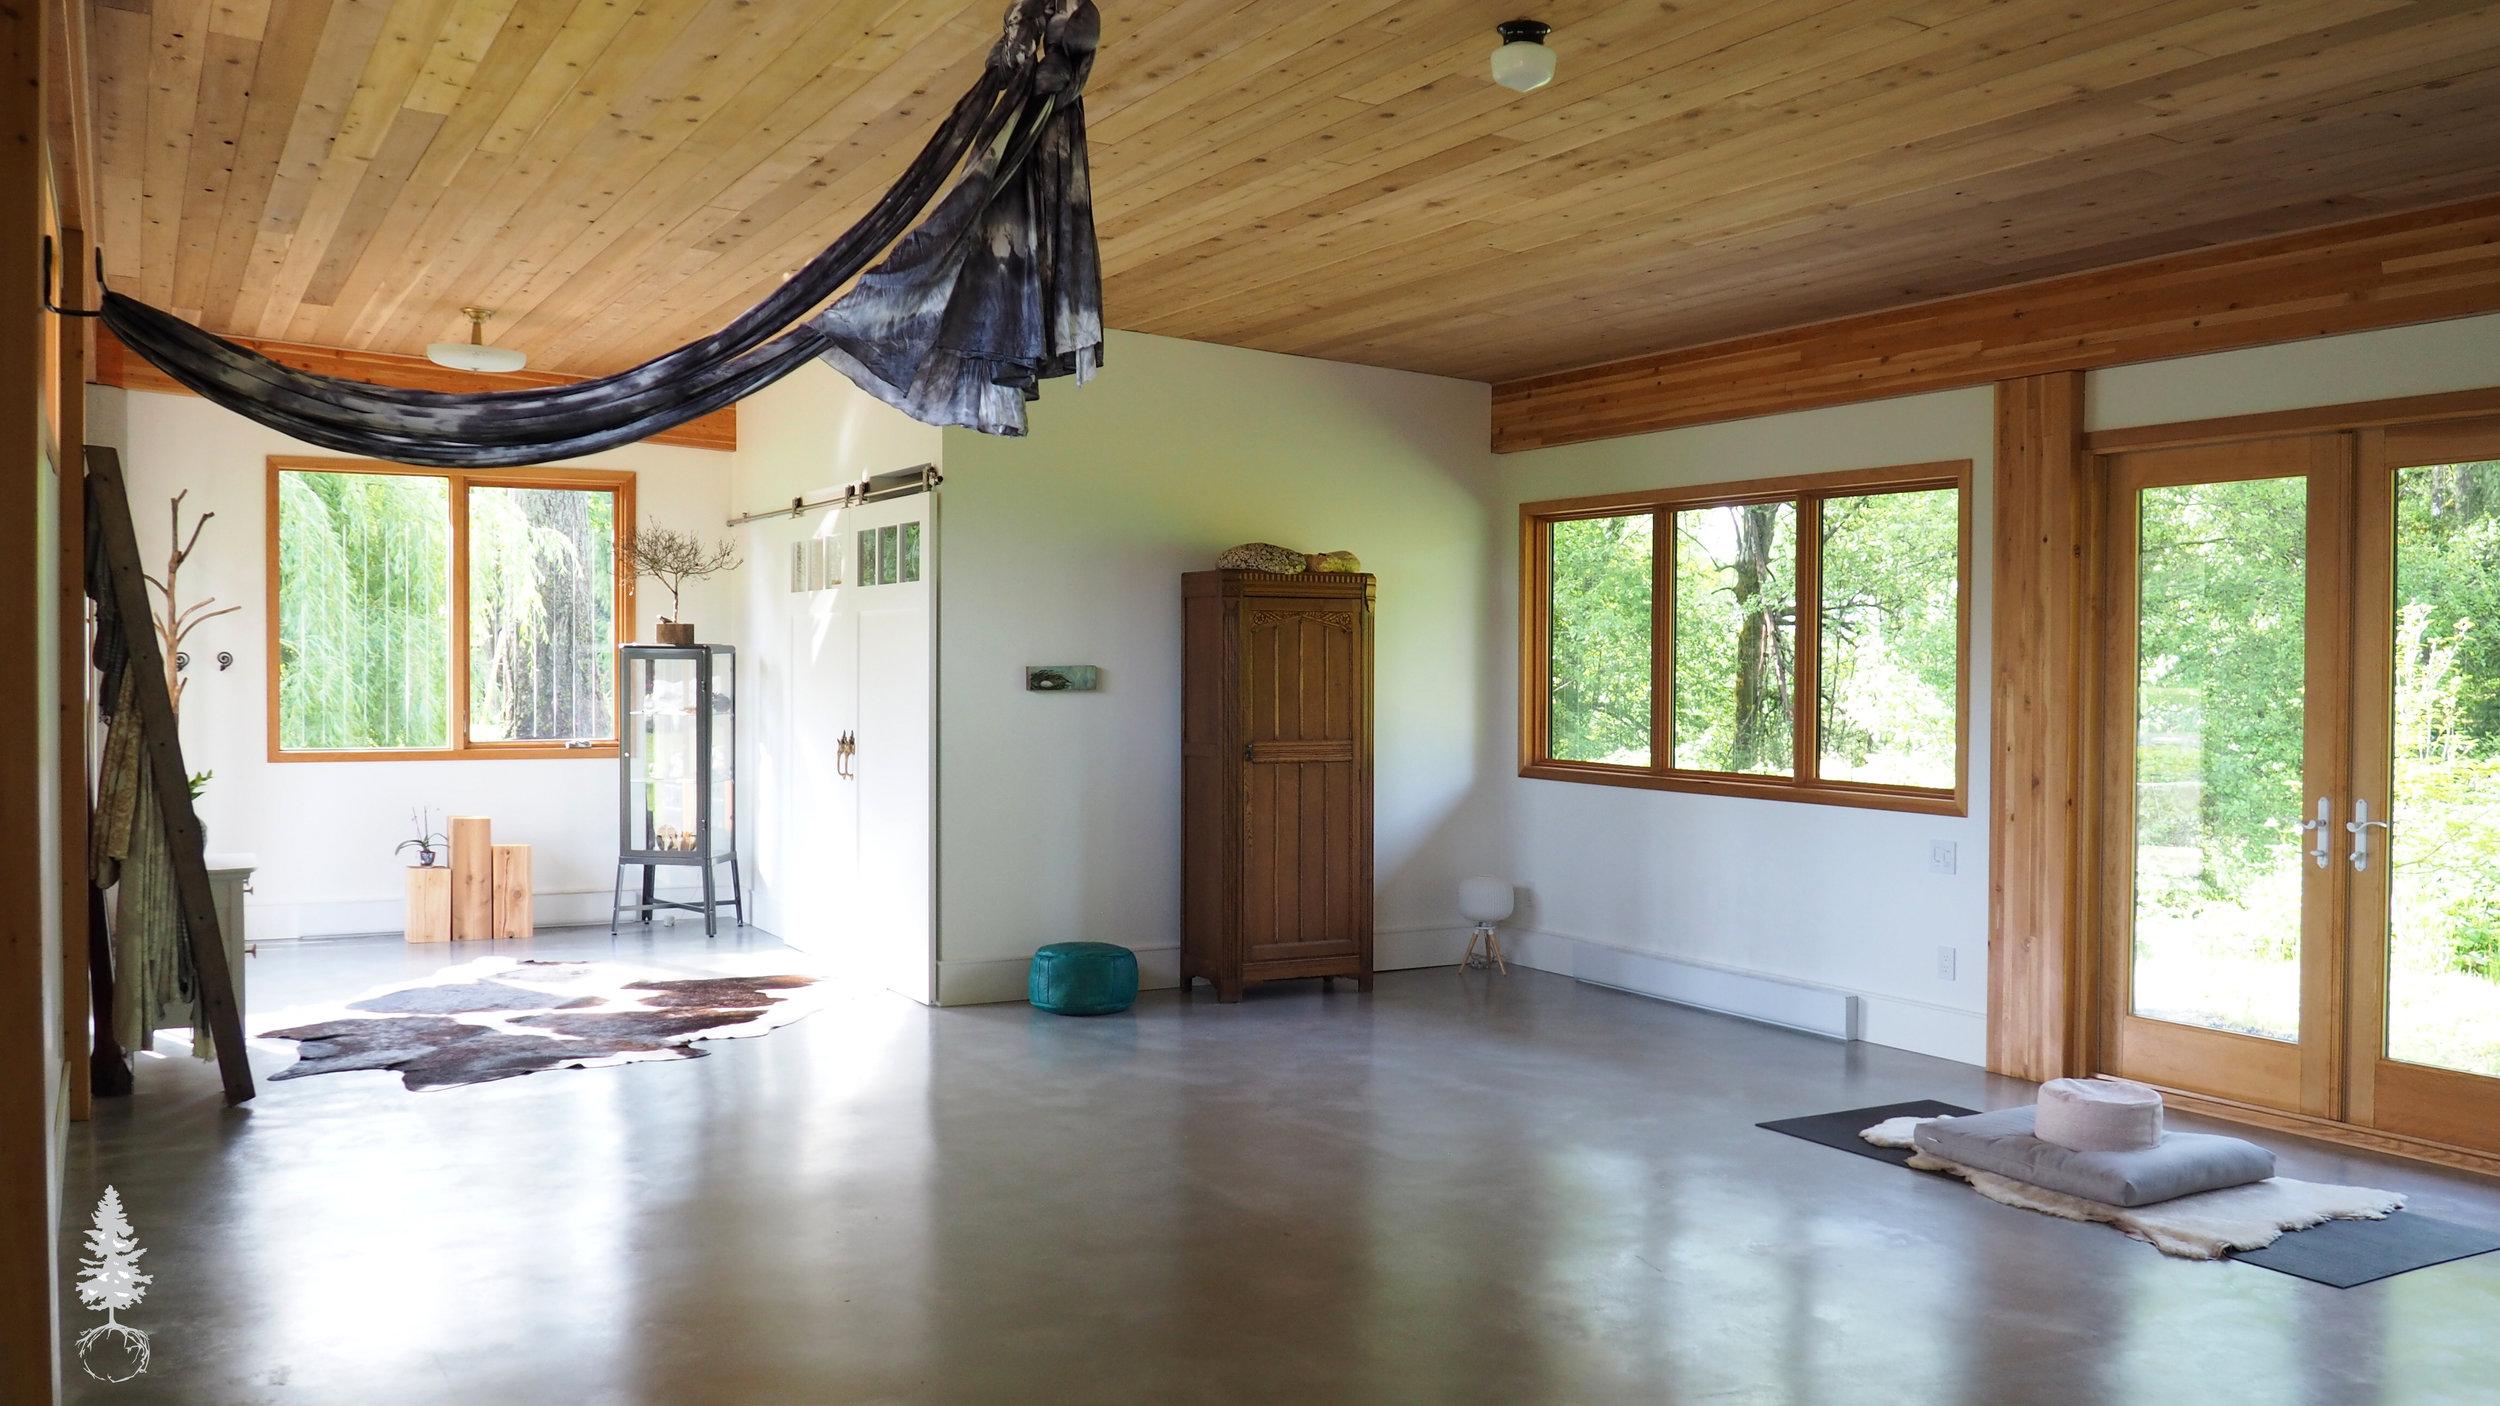 2 studio interior 2019.jpg